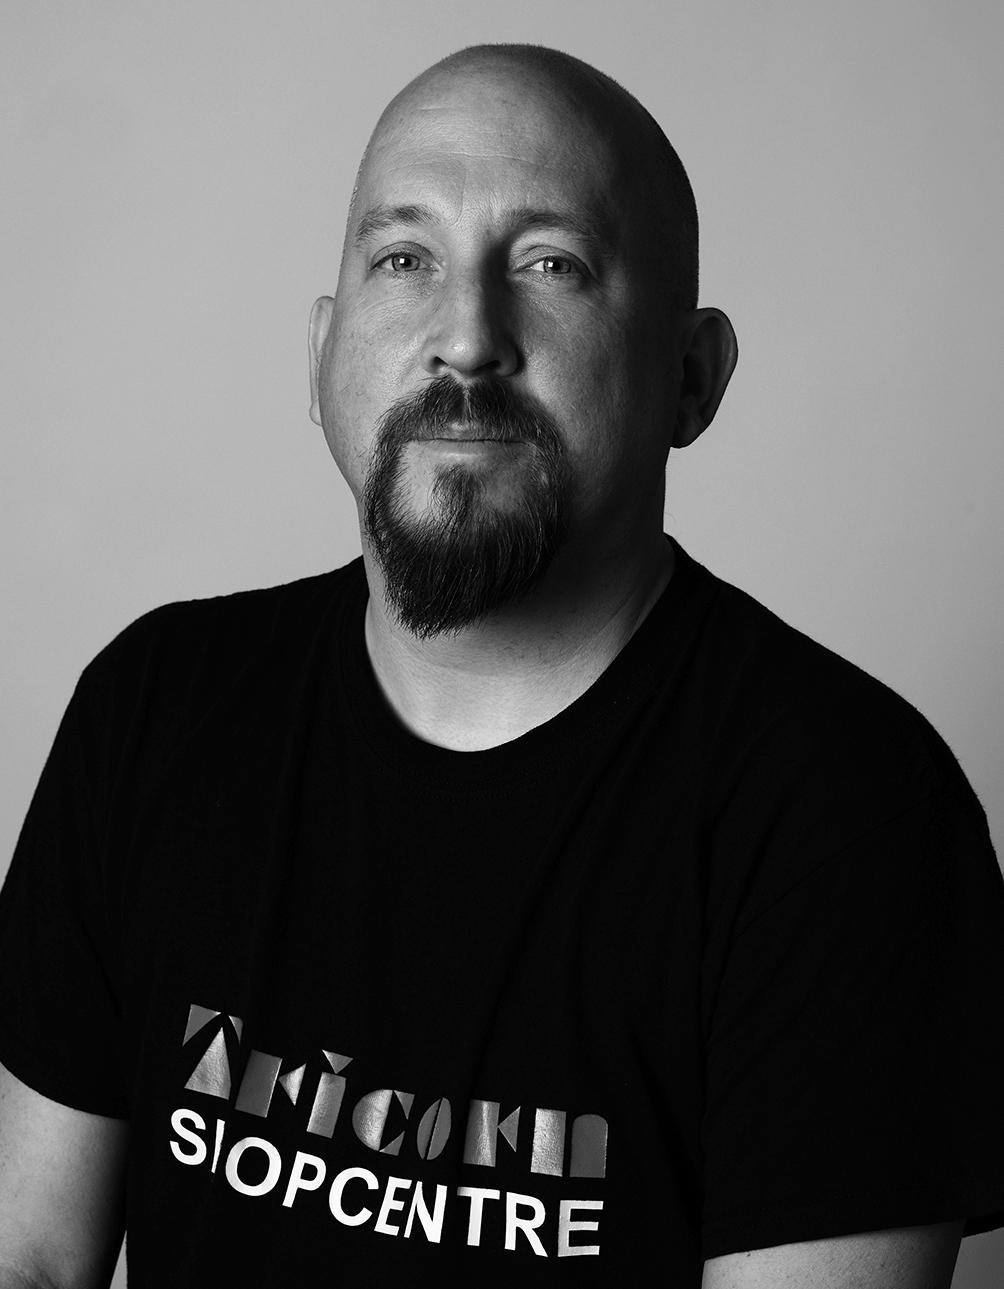 Alexander Counsell